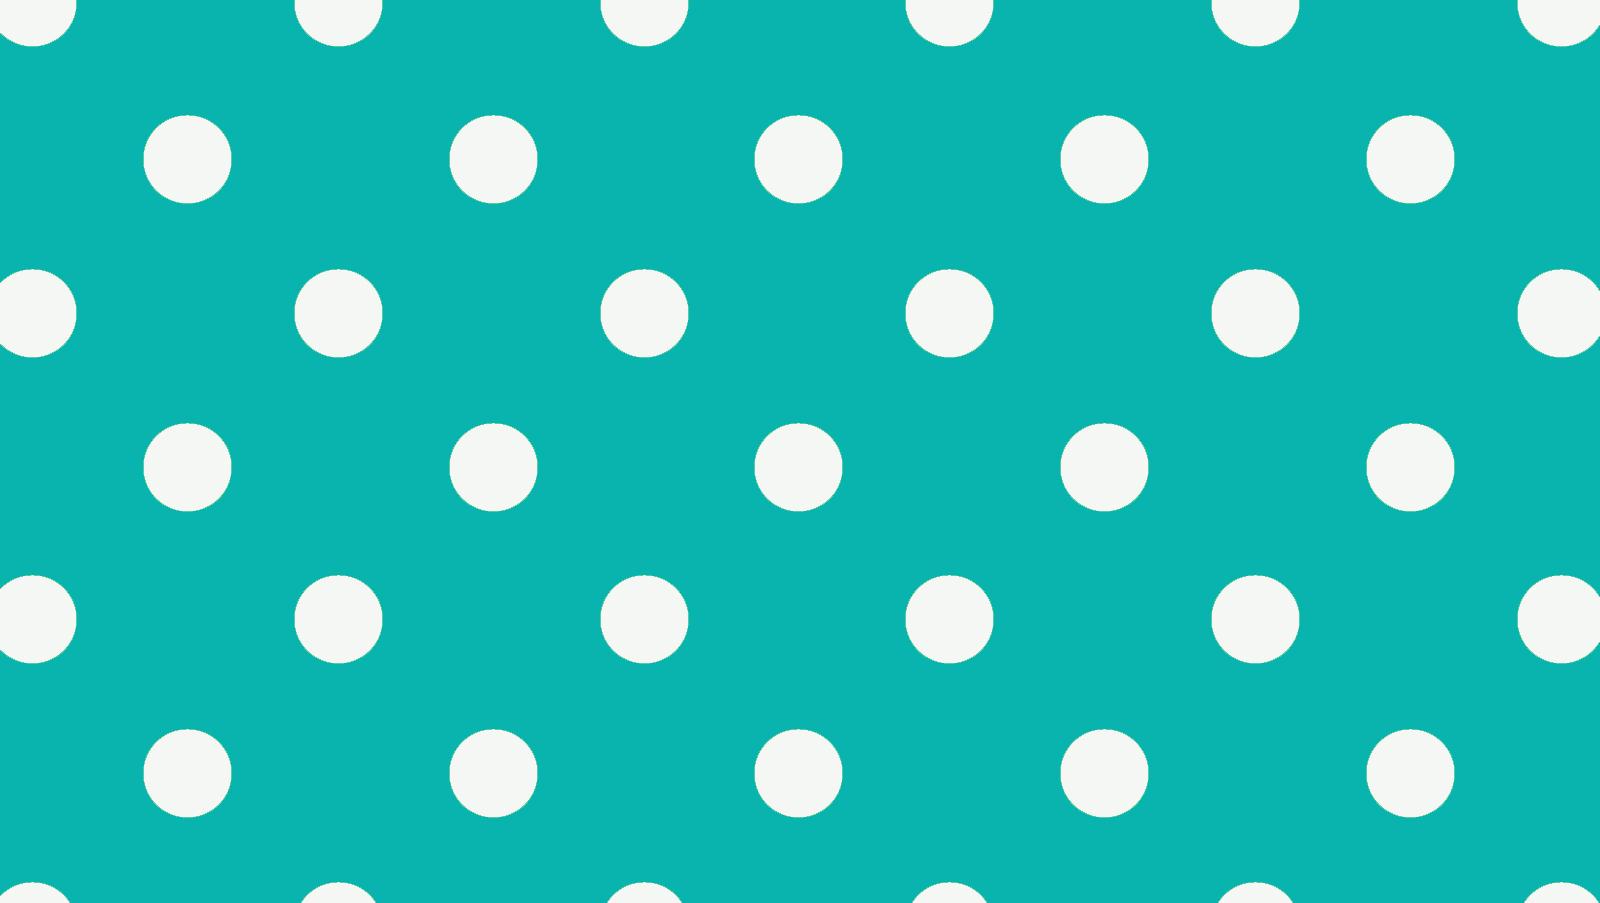 1600x903 Green Purple Polka Dot Wallpaper Clipart Collection